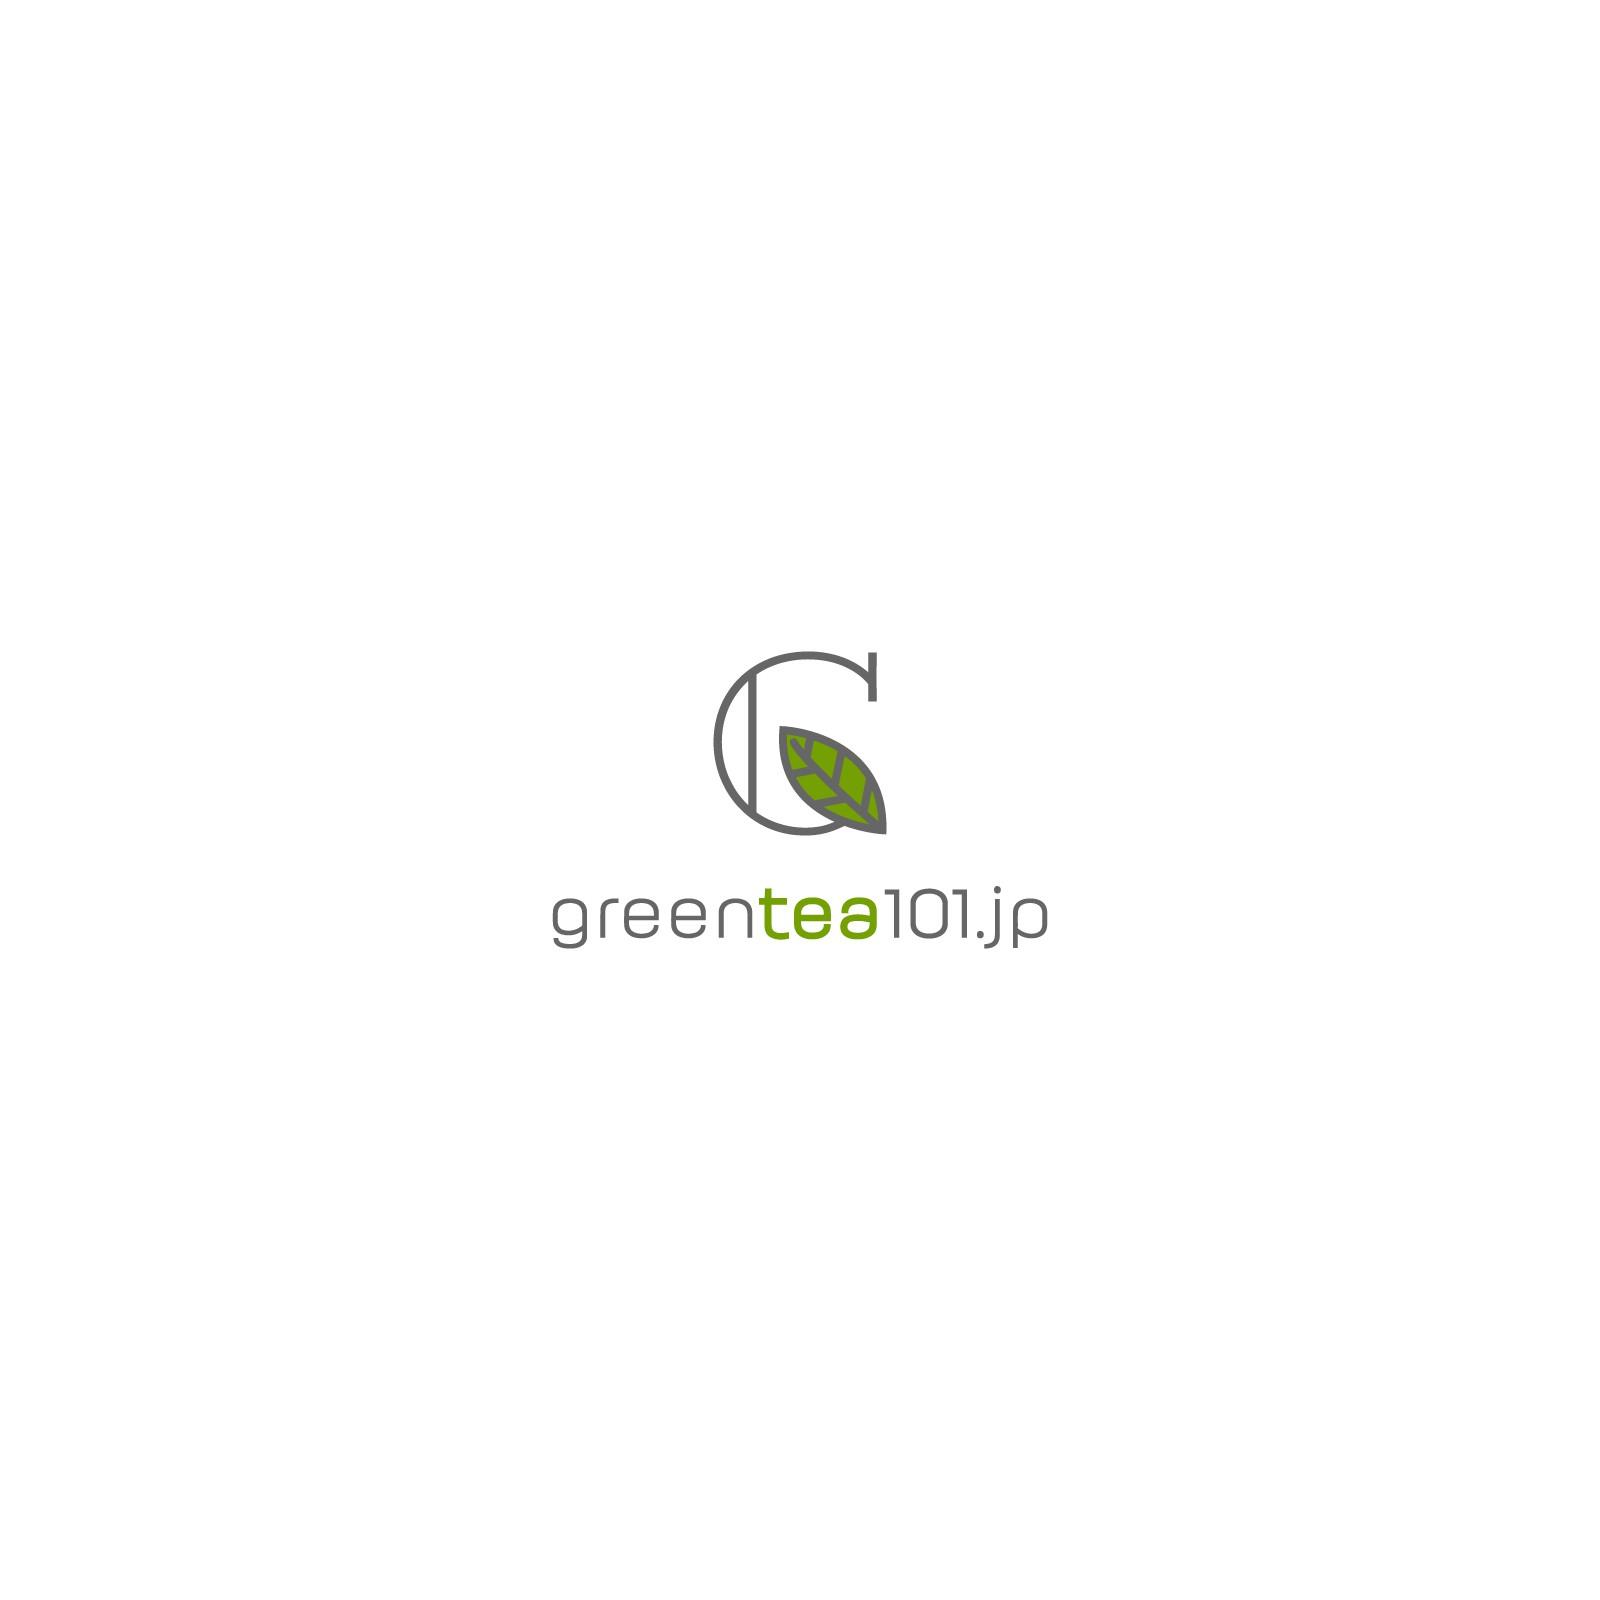 green tea/matcha を海外に発信するウェブサイトのロゴ作成お願いします!